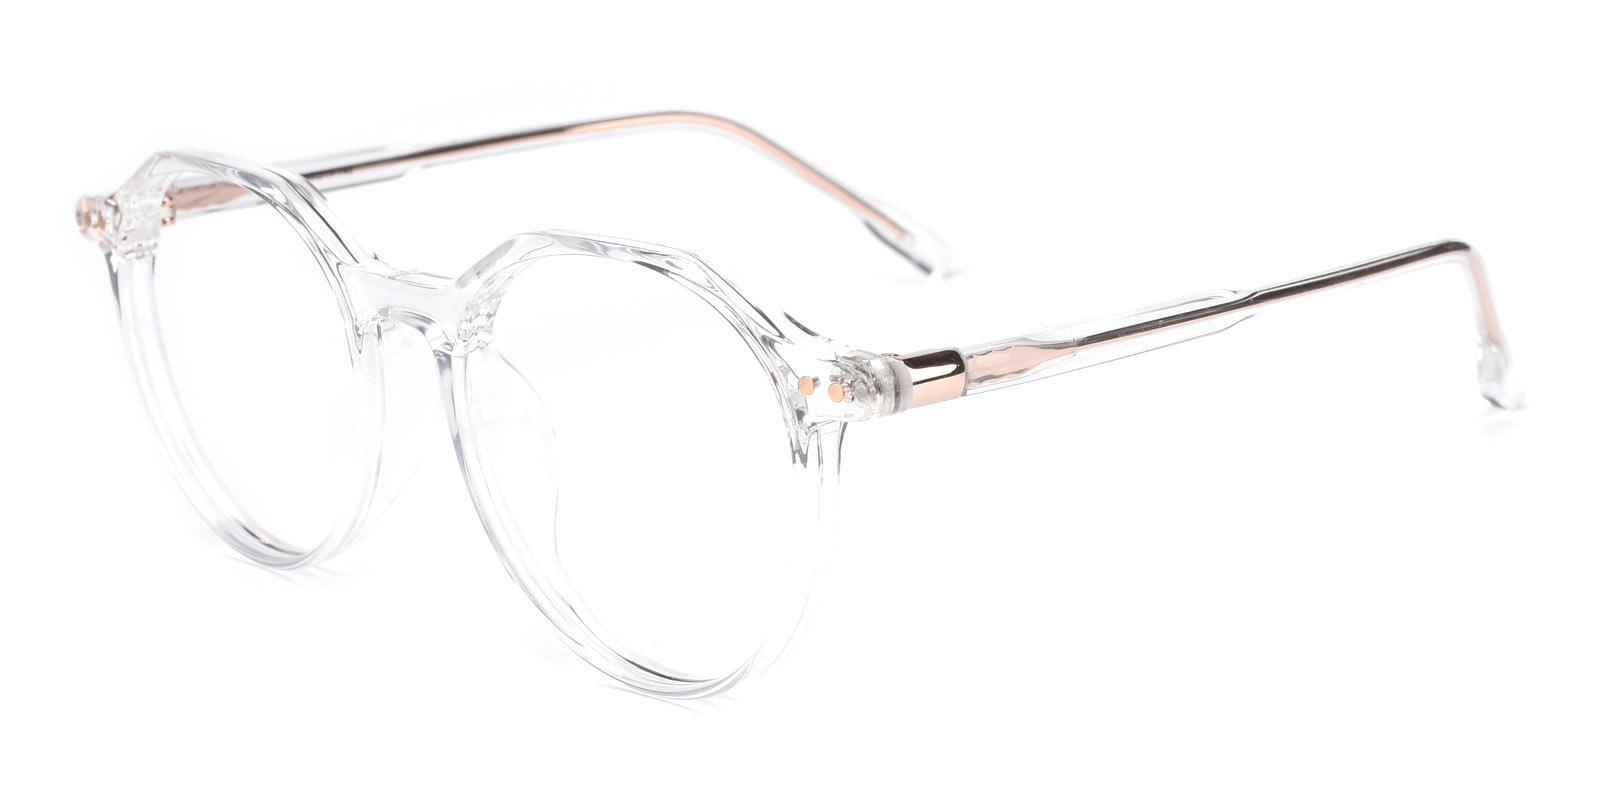 Cappuccino-Translucent-Round-TR-Eyeglasses-detail